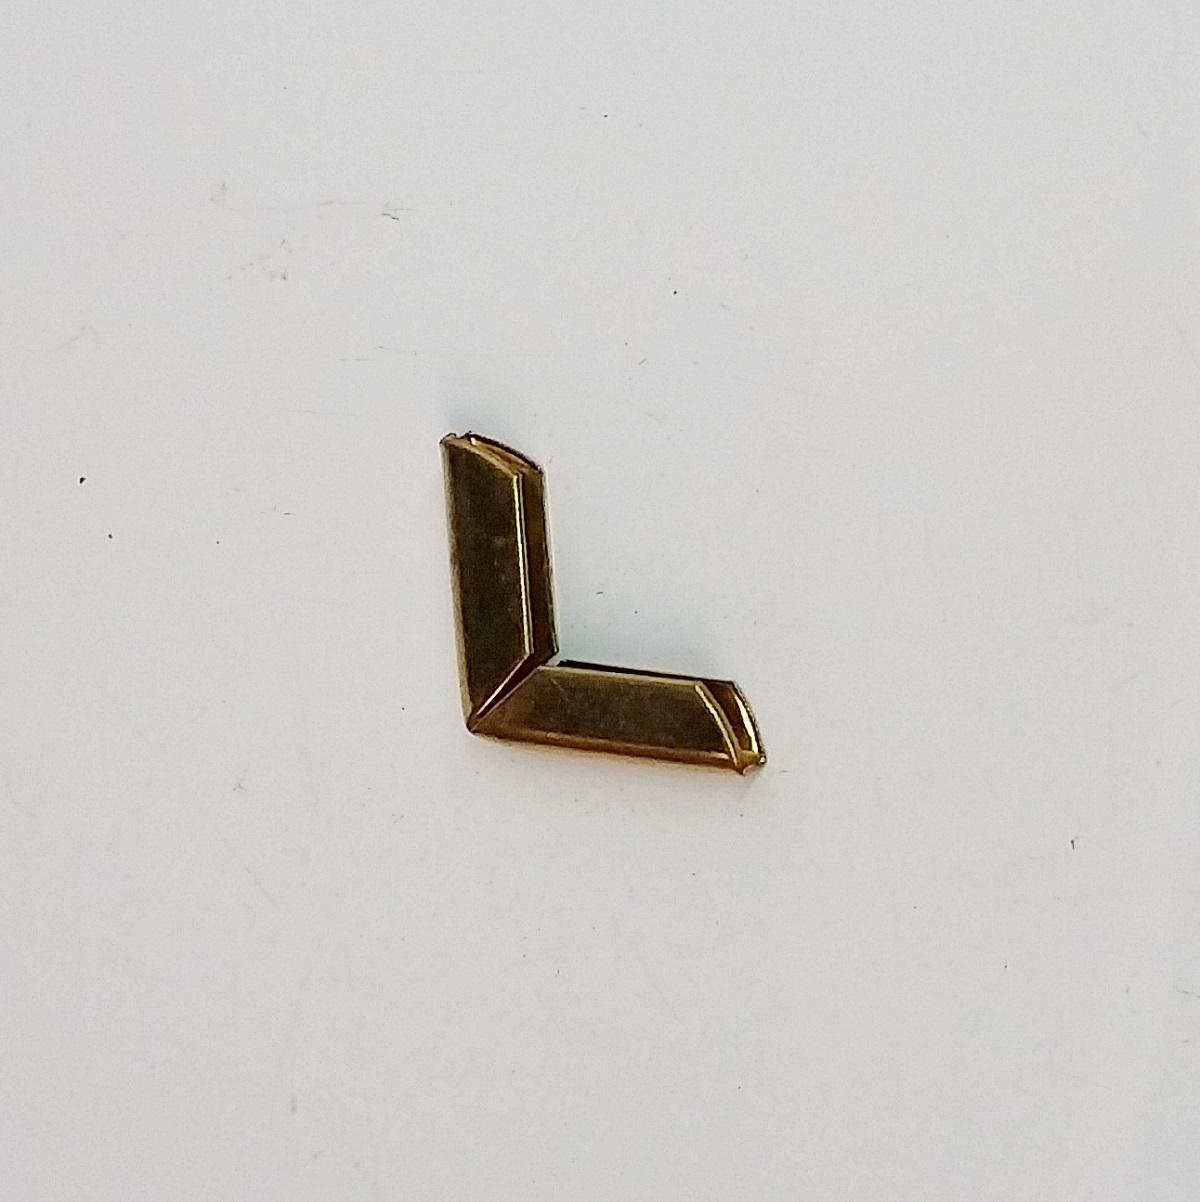 Cantoneira 15mm x 15mm Latonada